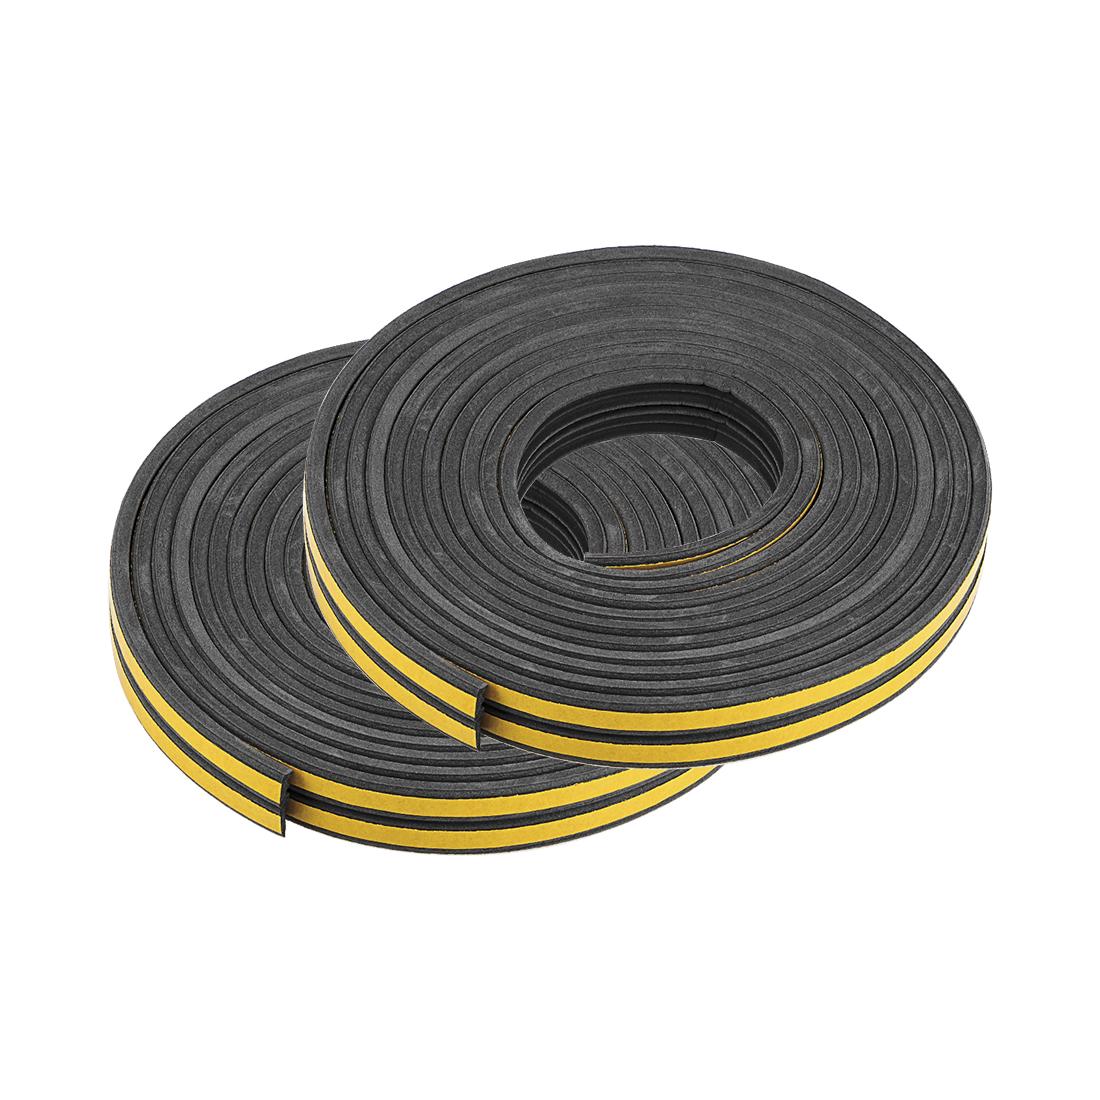 Foam Tape Adhesive 9mm Width 4mm Thick, Total 52 Feet Long Black 4Pcs